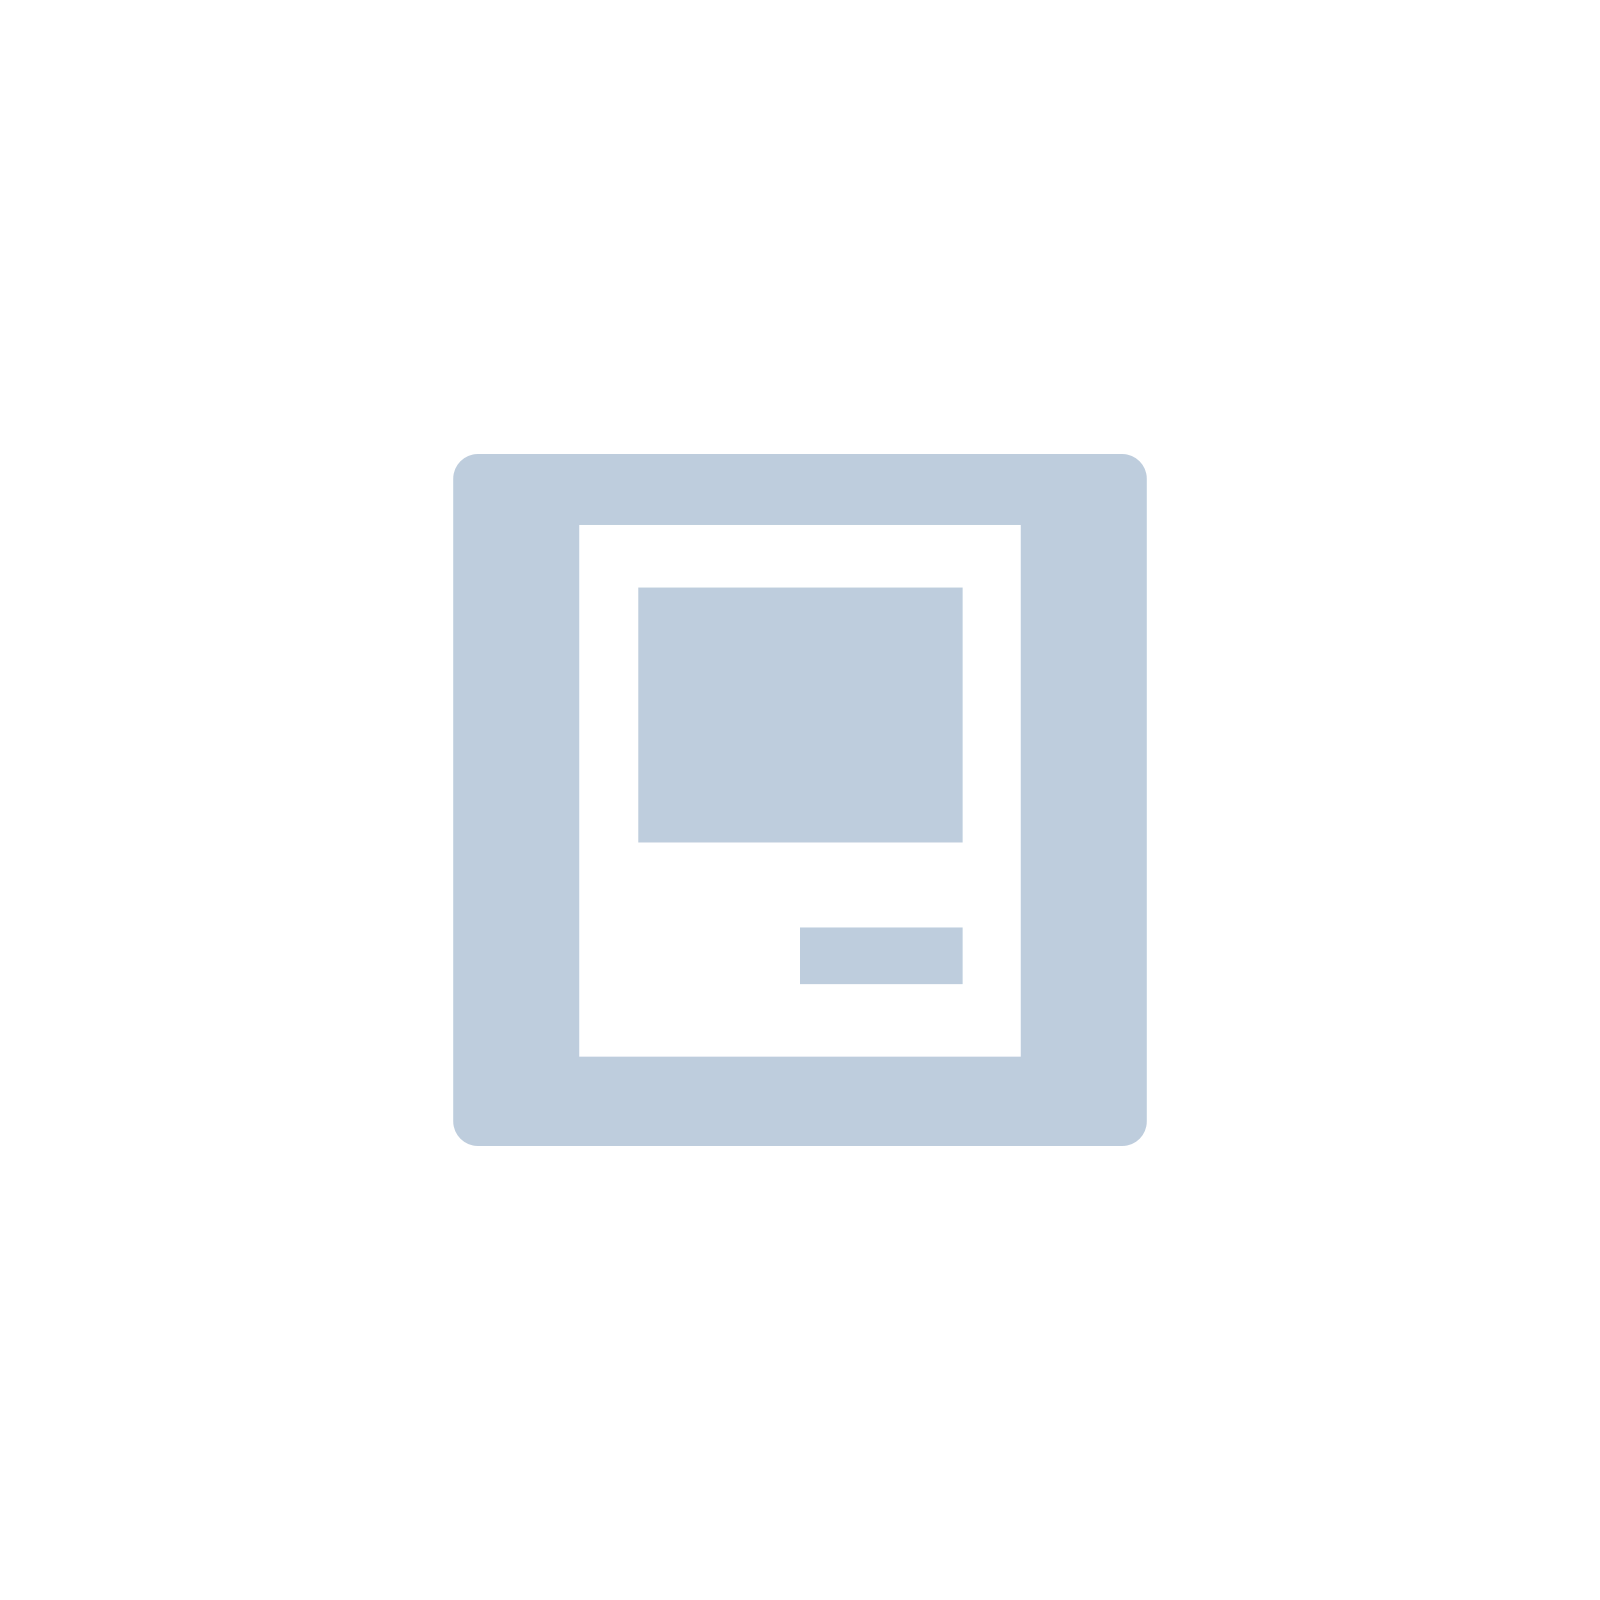 Mac mini Intel Core 2 Duo 2.4GHz (Macmini4,1)